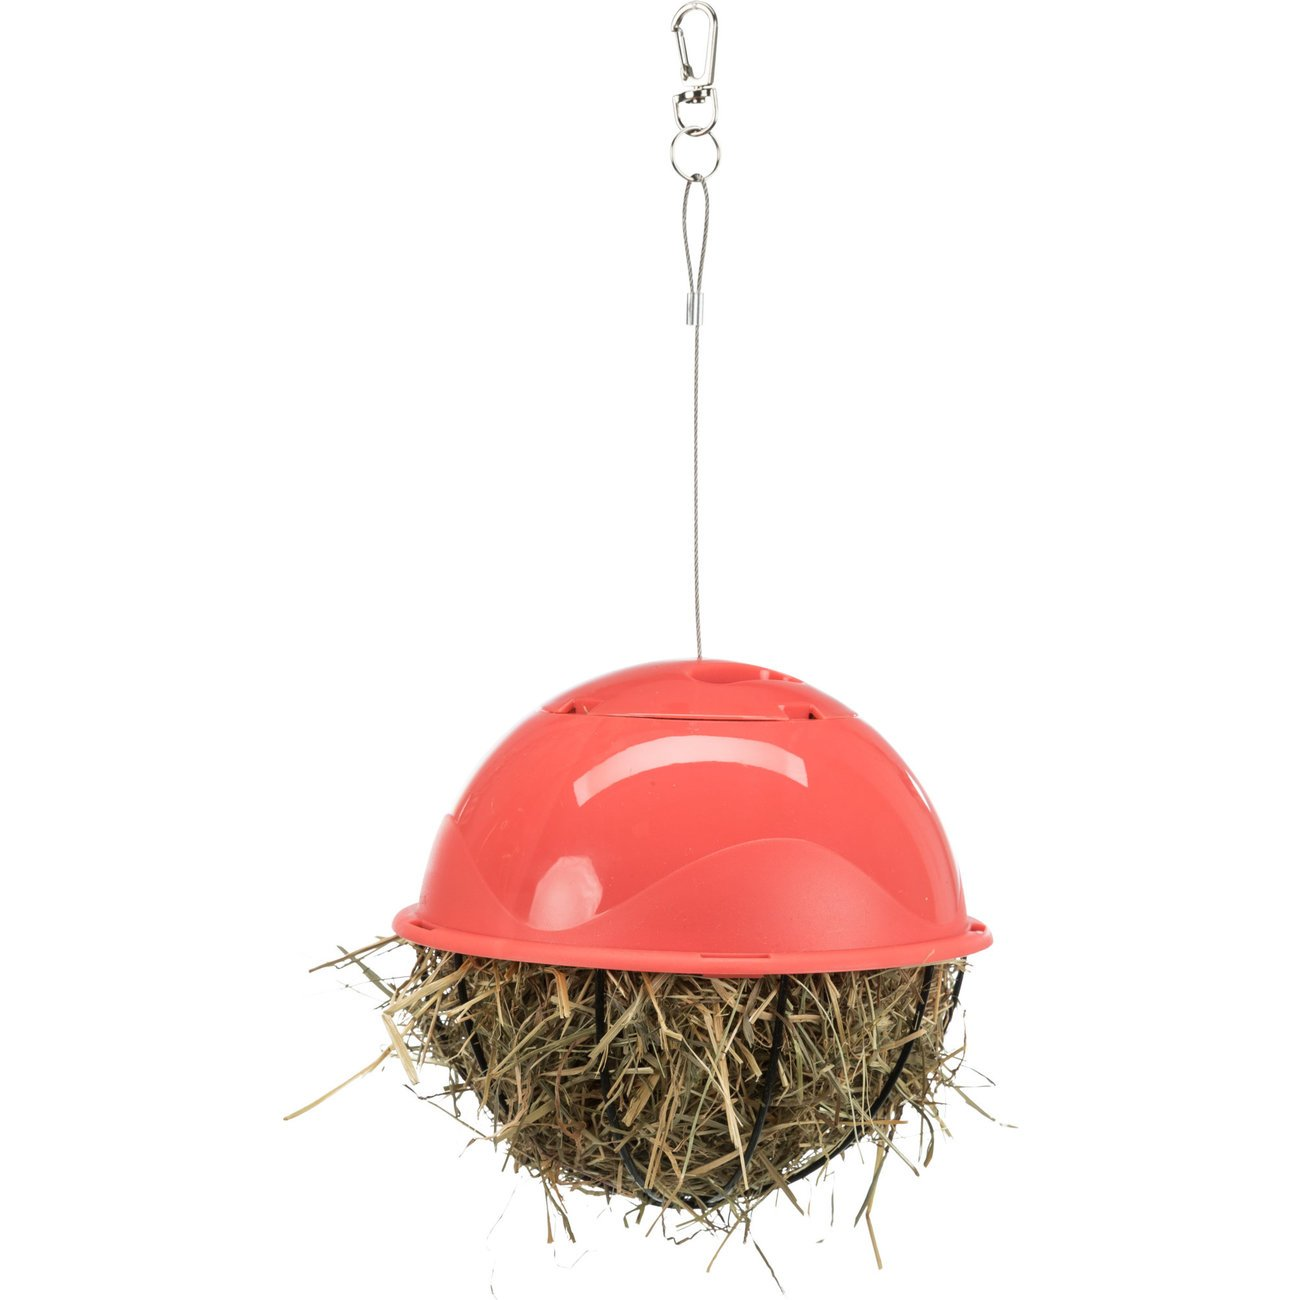 TRIXIE Kleintier Food-Ball zum Befüllen Preview Image